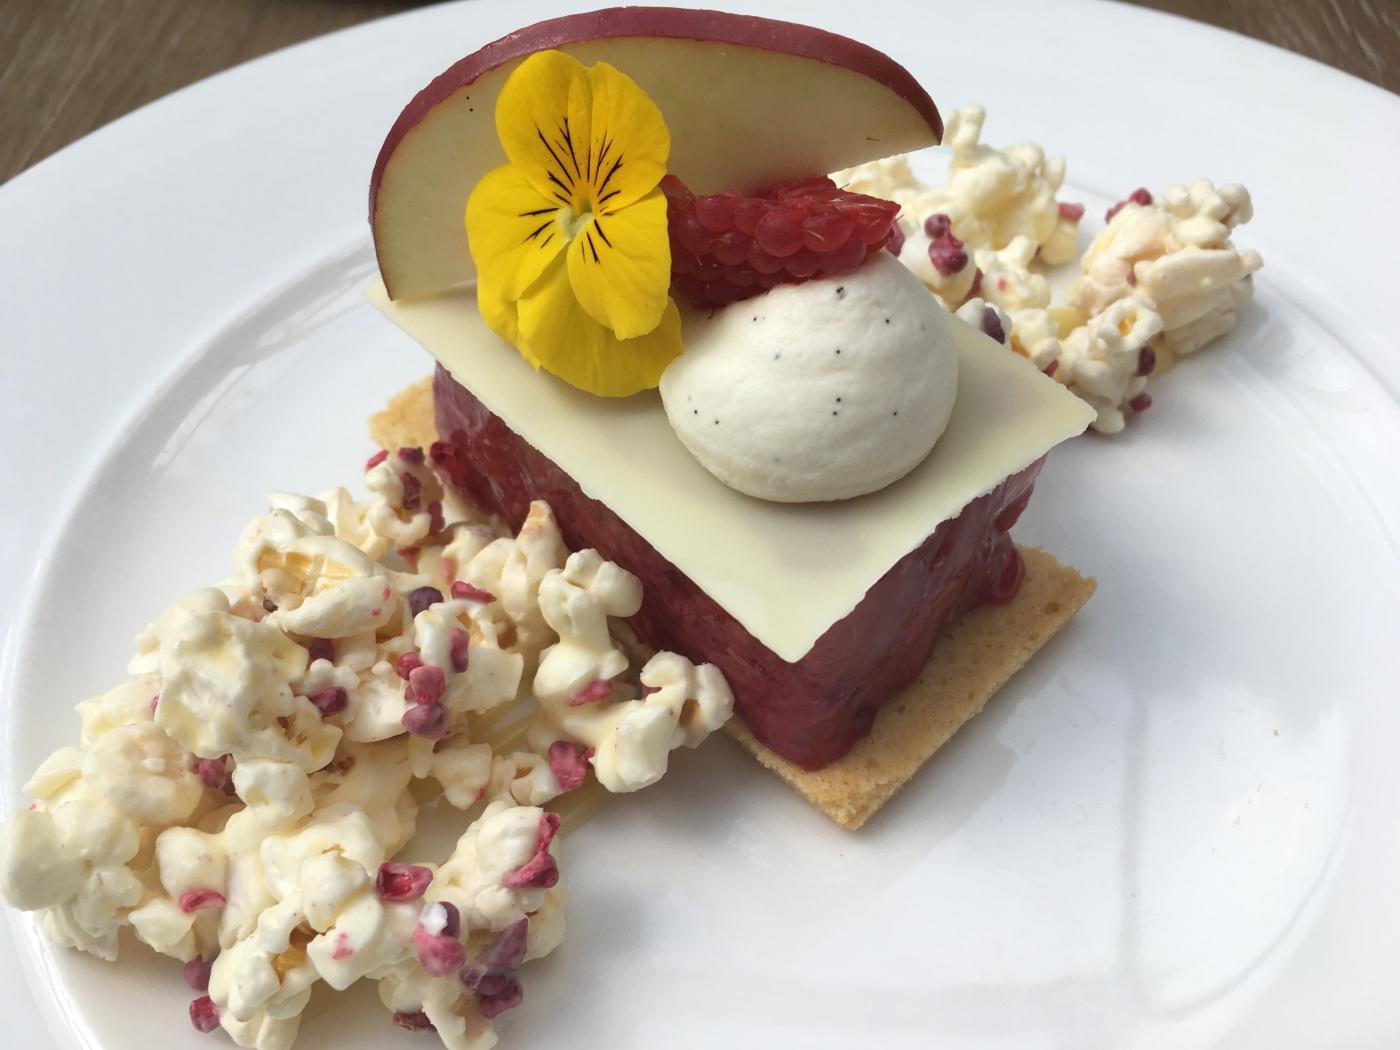 The Refectory York Pink lady dessert